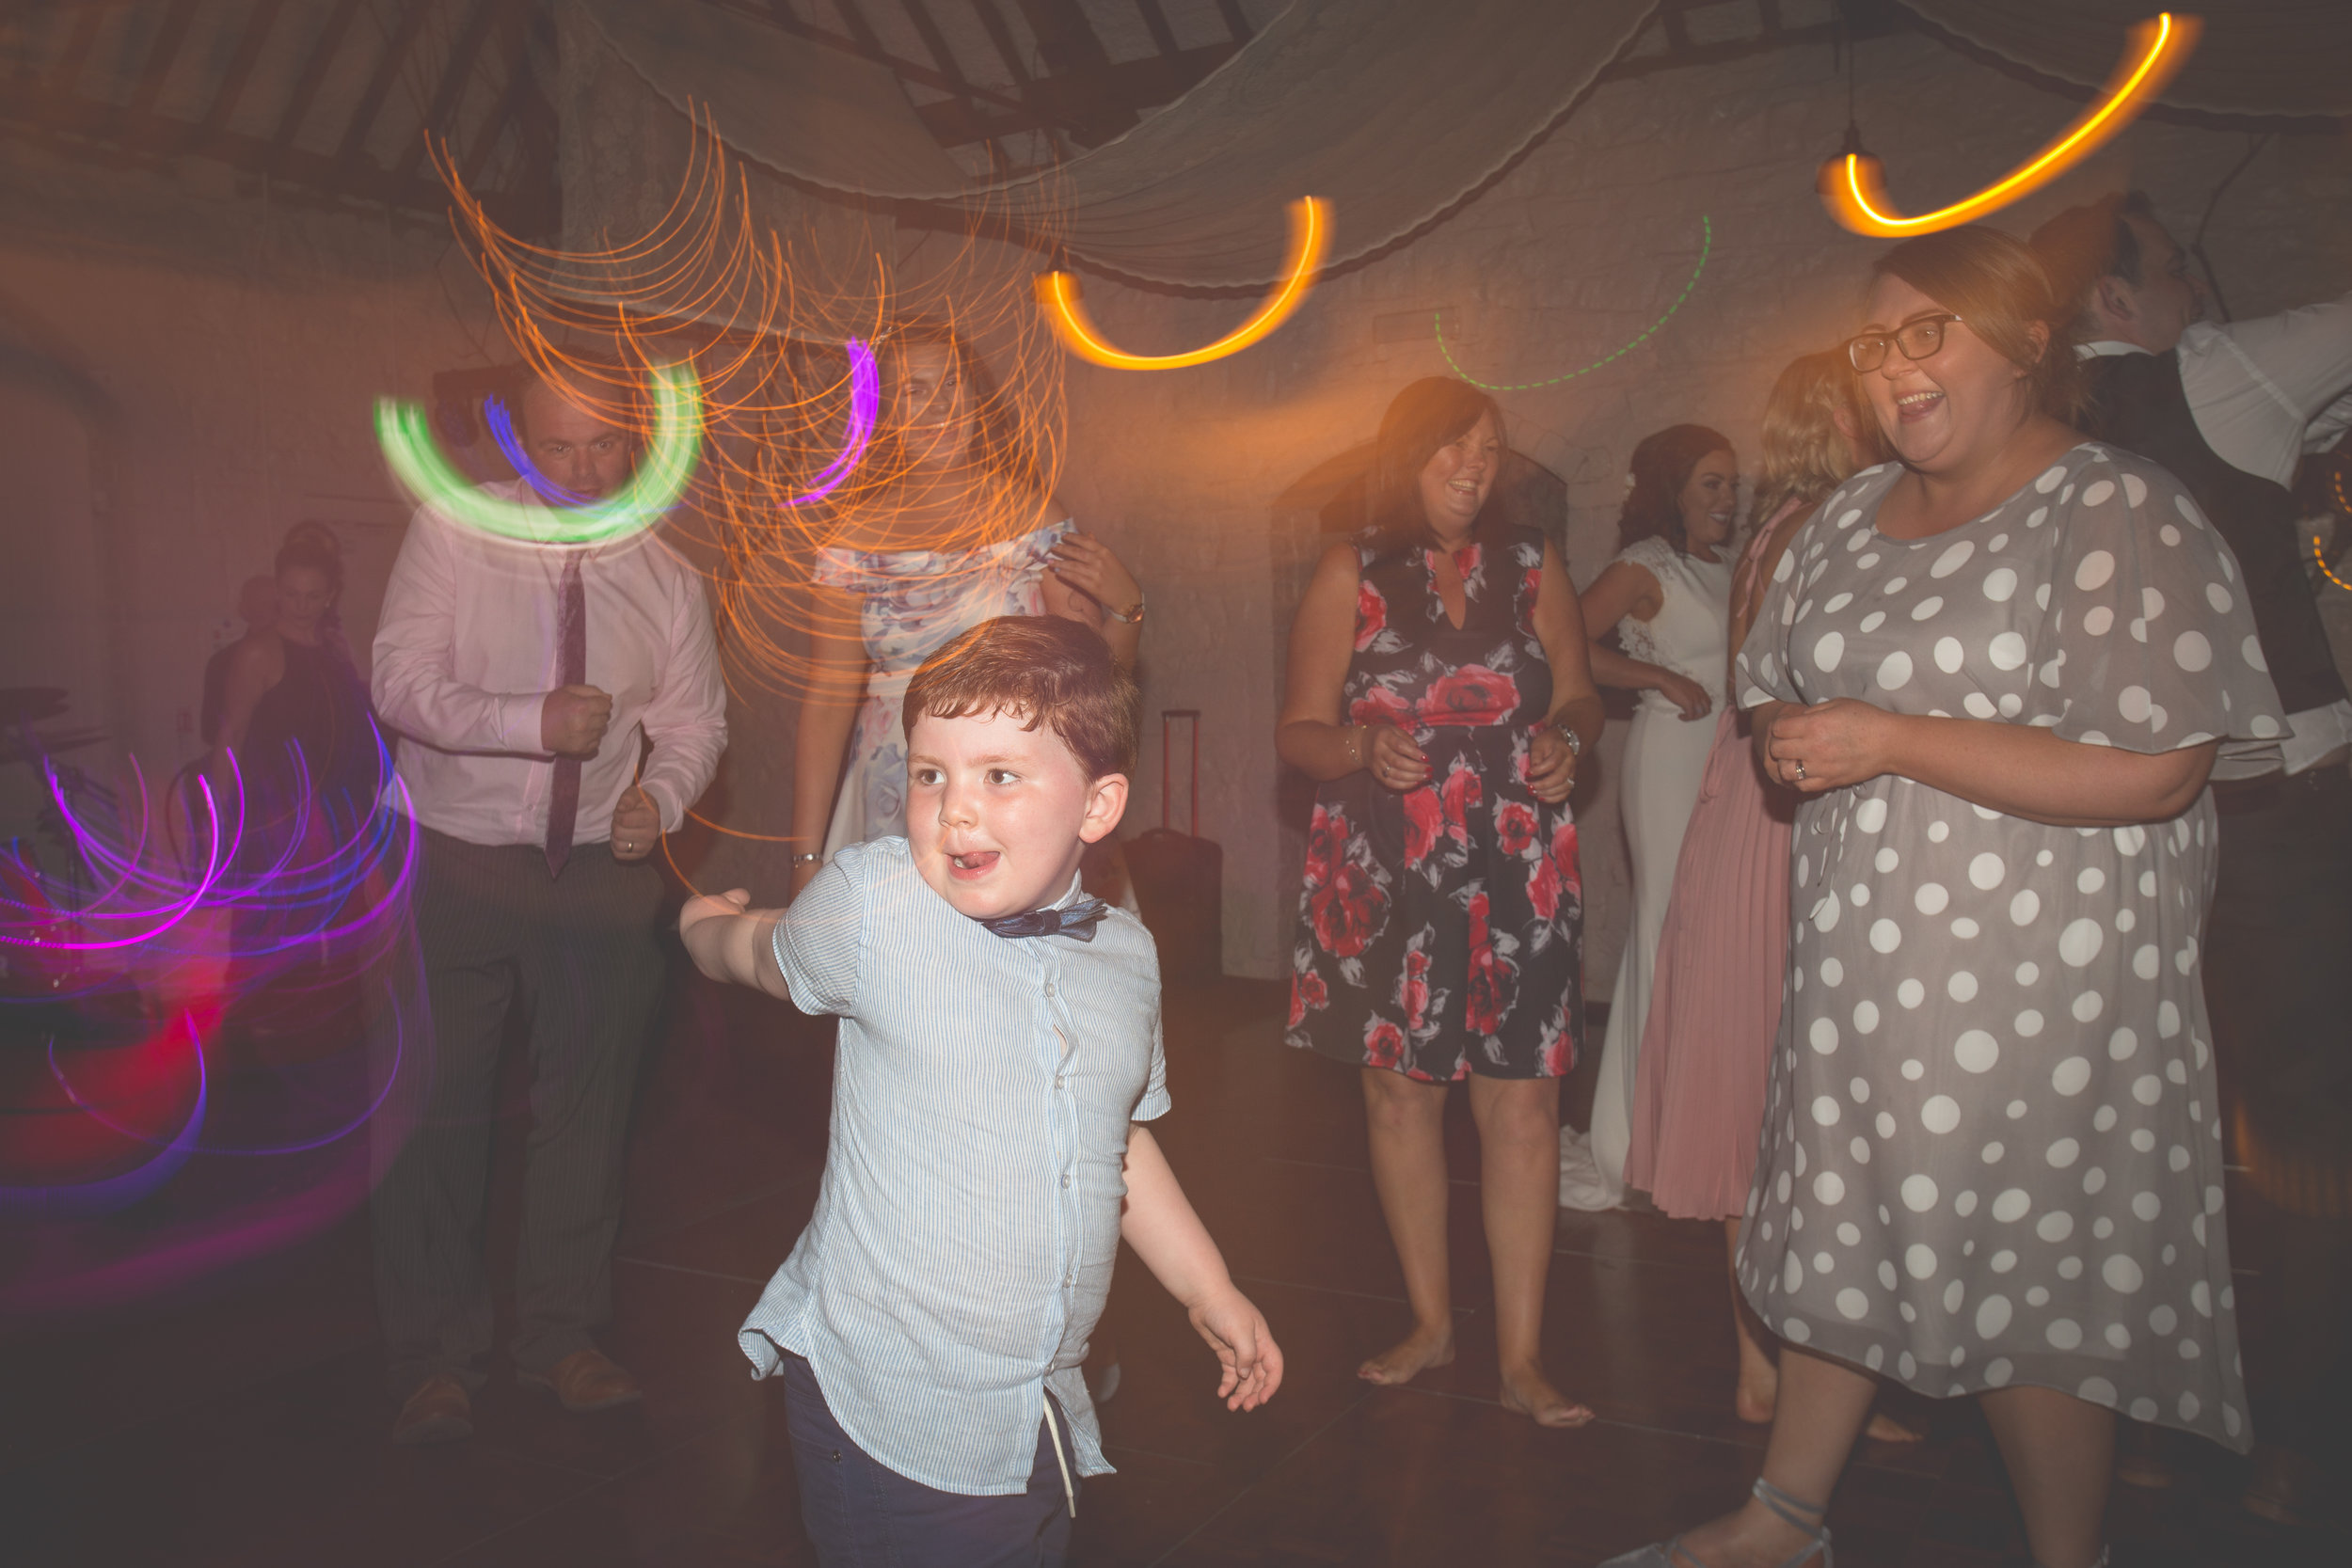 Brian McEwan Wedding Photography | Carol-Annee & Sean | The Dancing-79.jpg